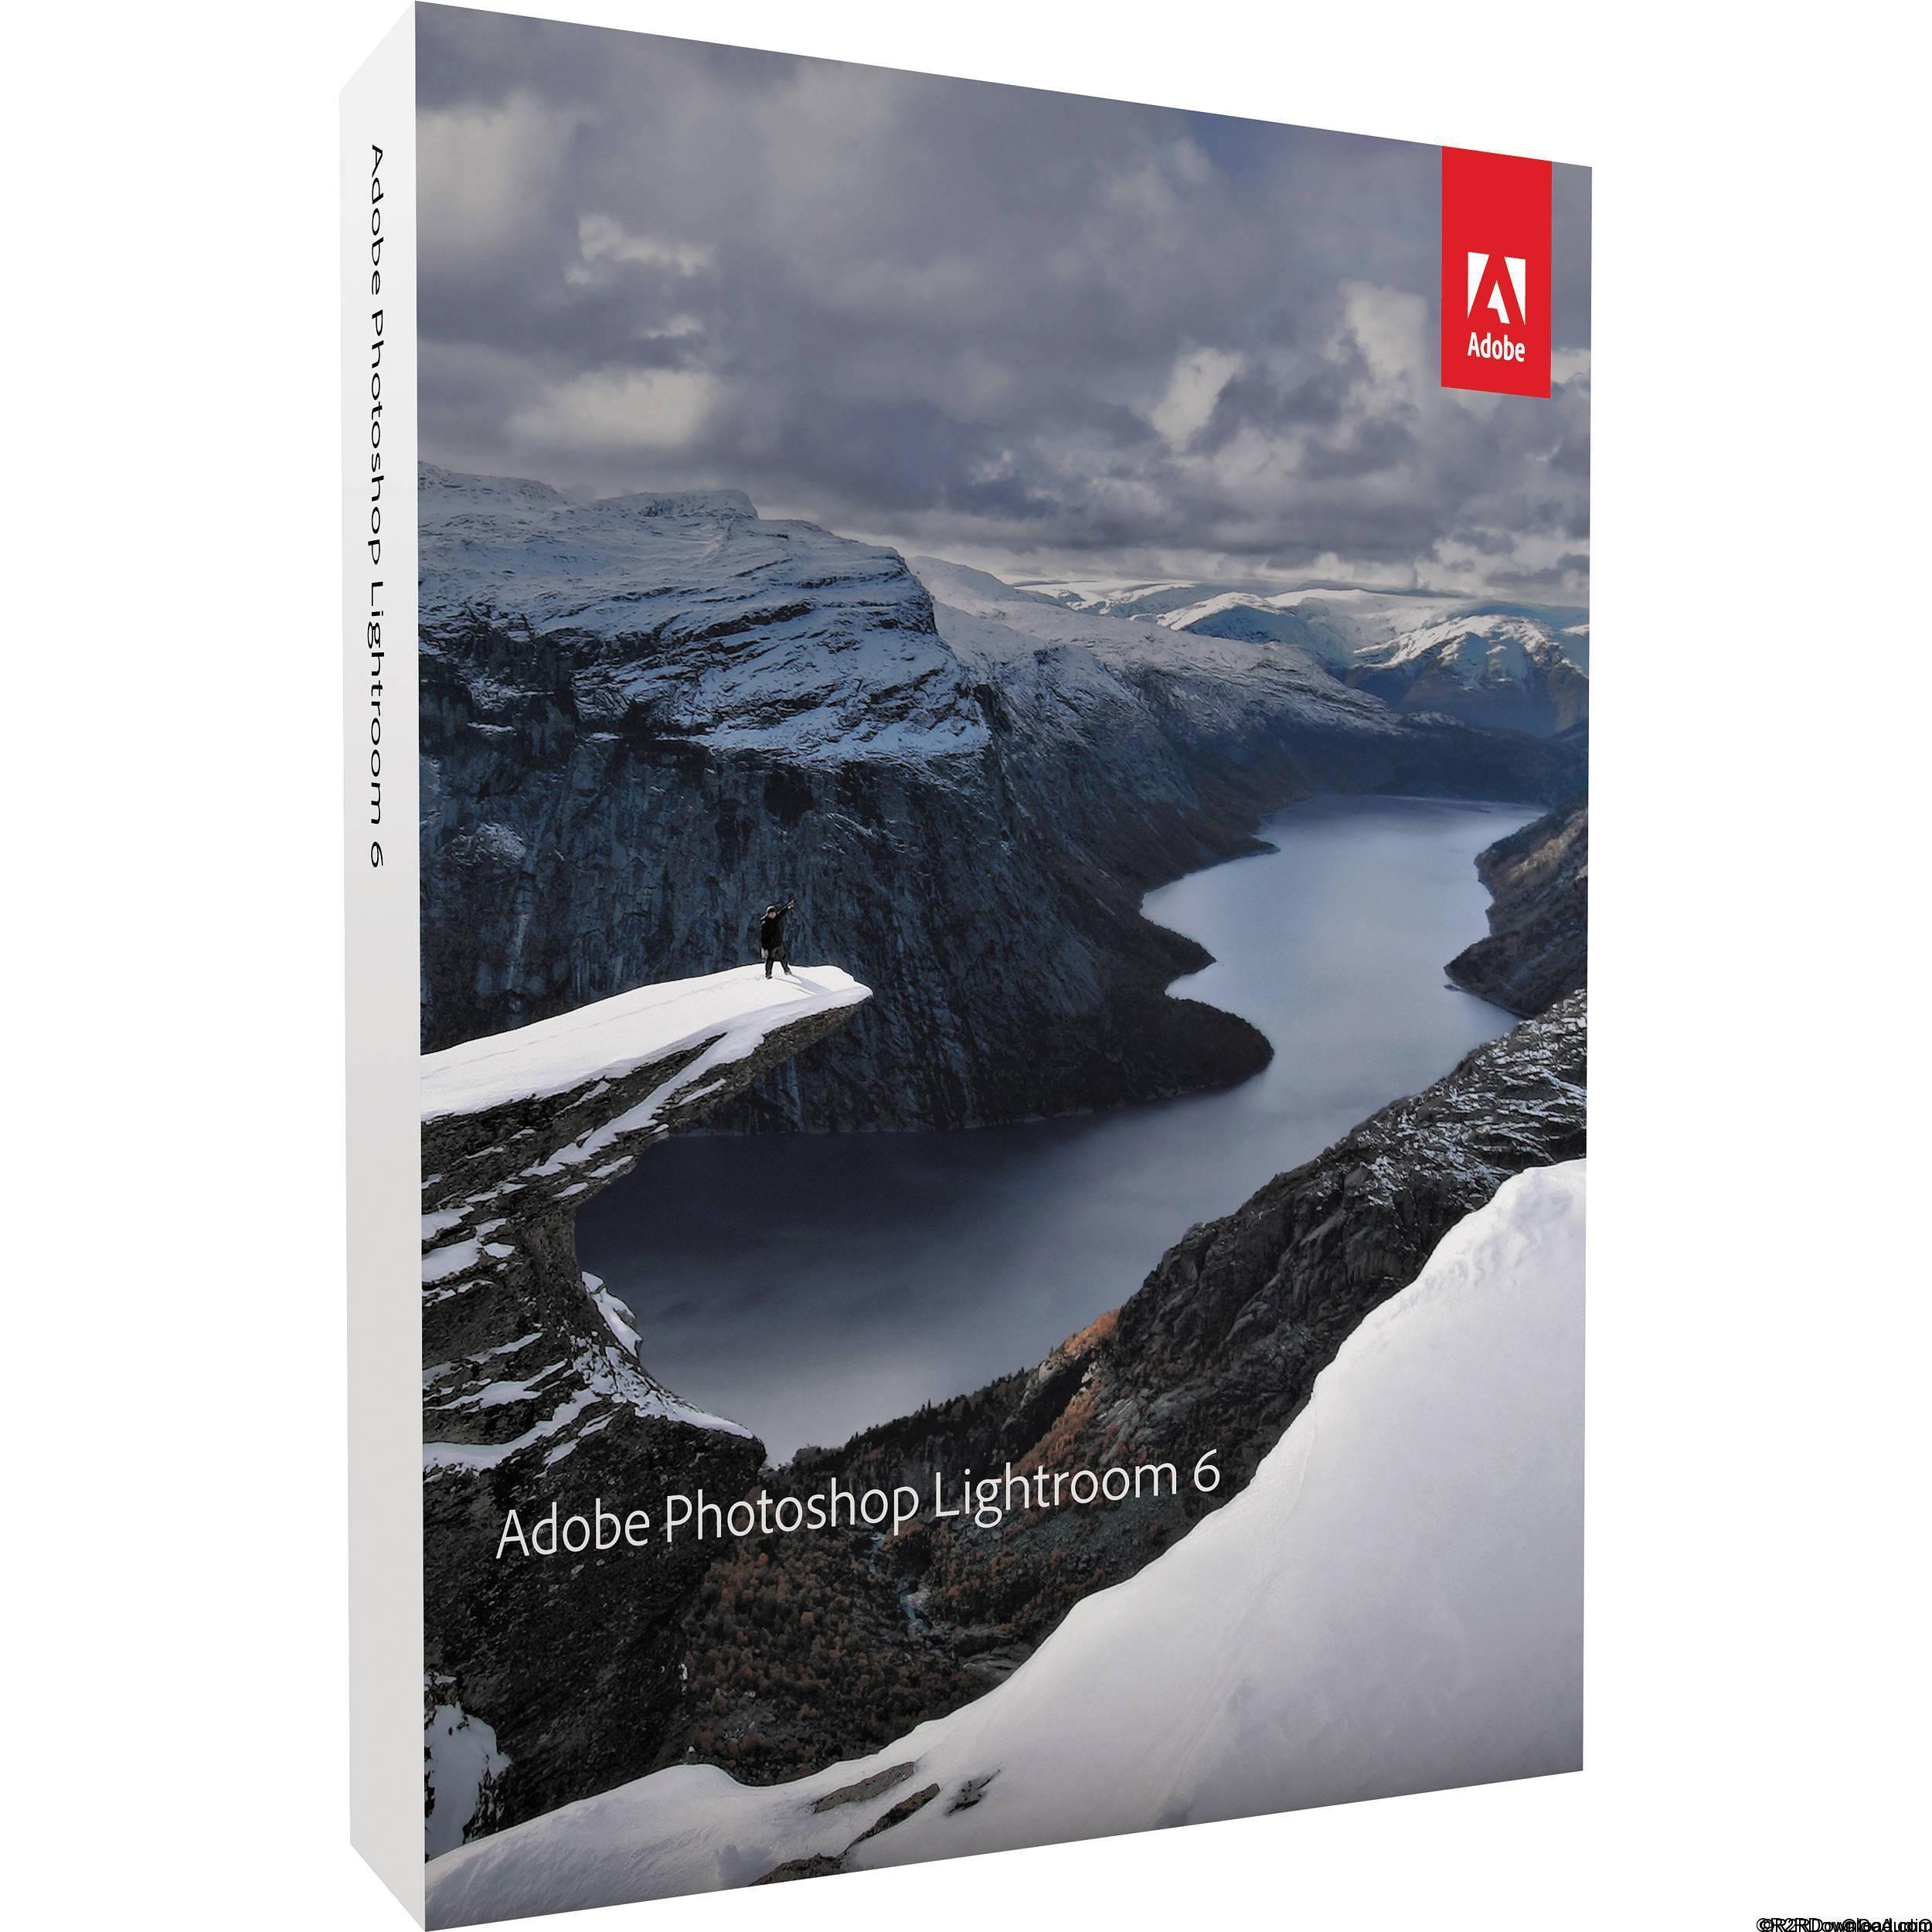 Photoshop Lightroom Free Download For Mac